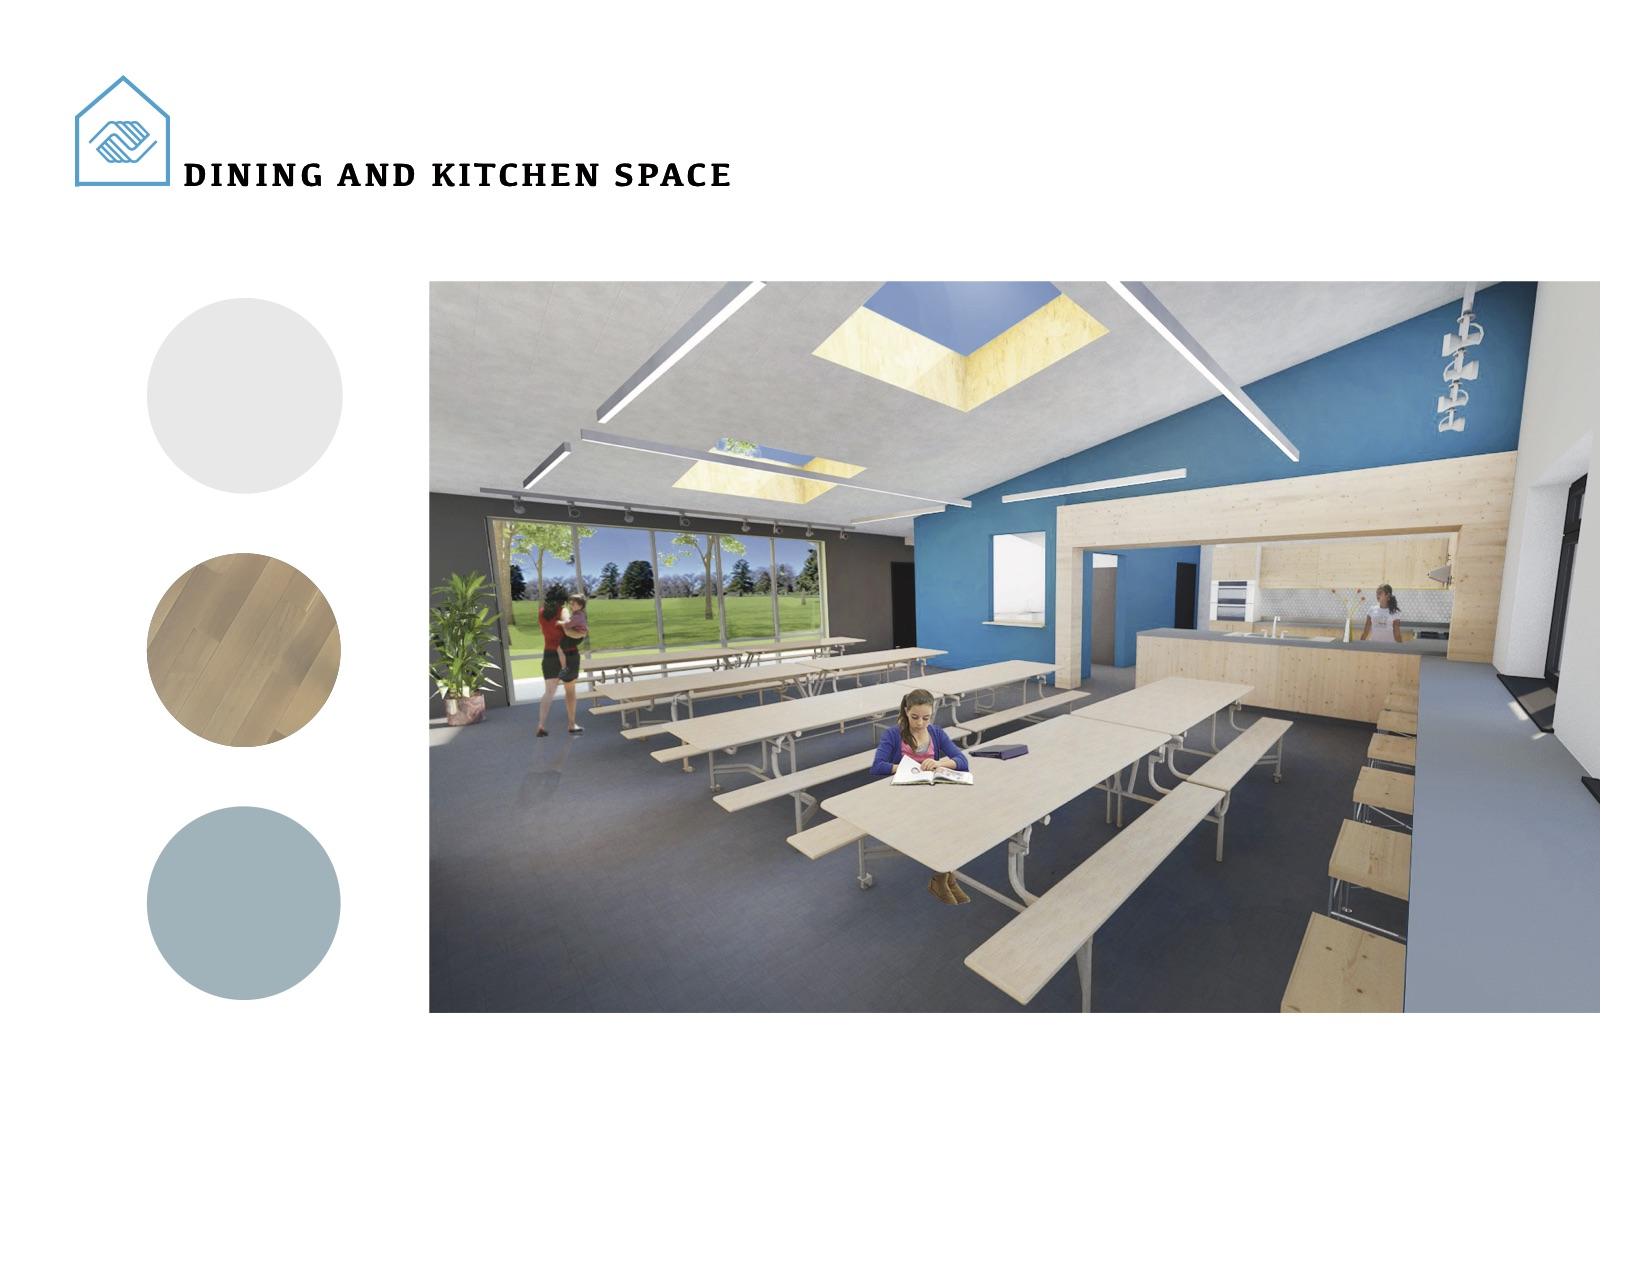 Interior Design Presentation 09191632.jpg